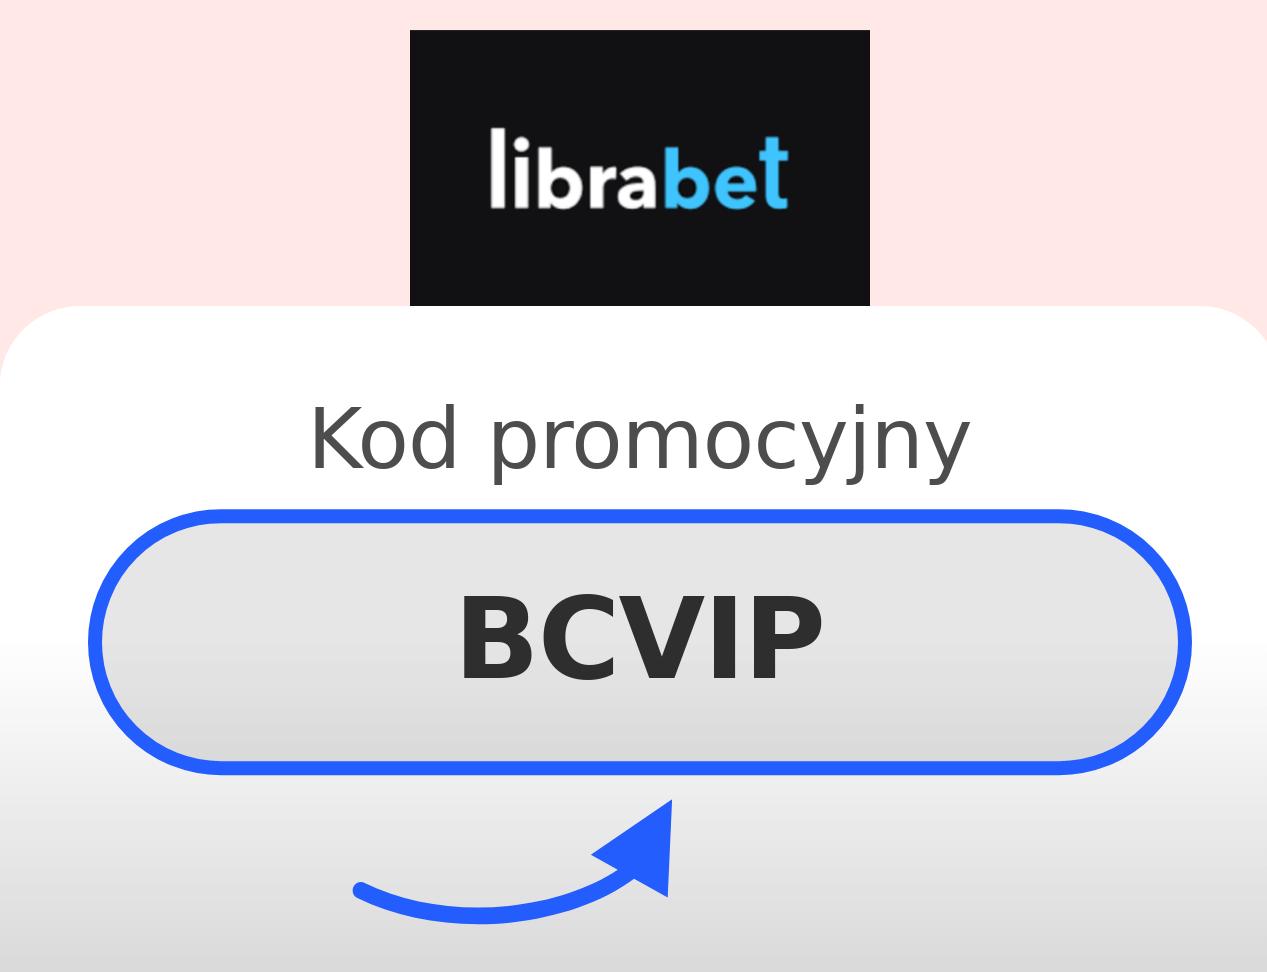 LibraBet Kod Promocyjny